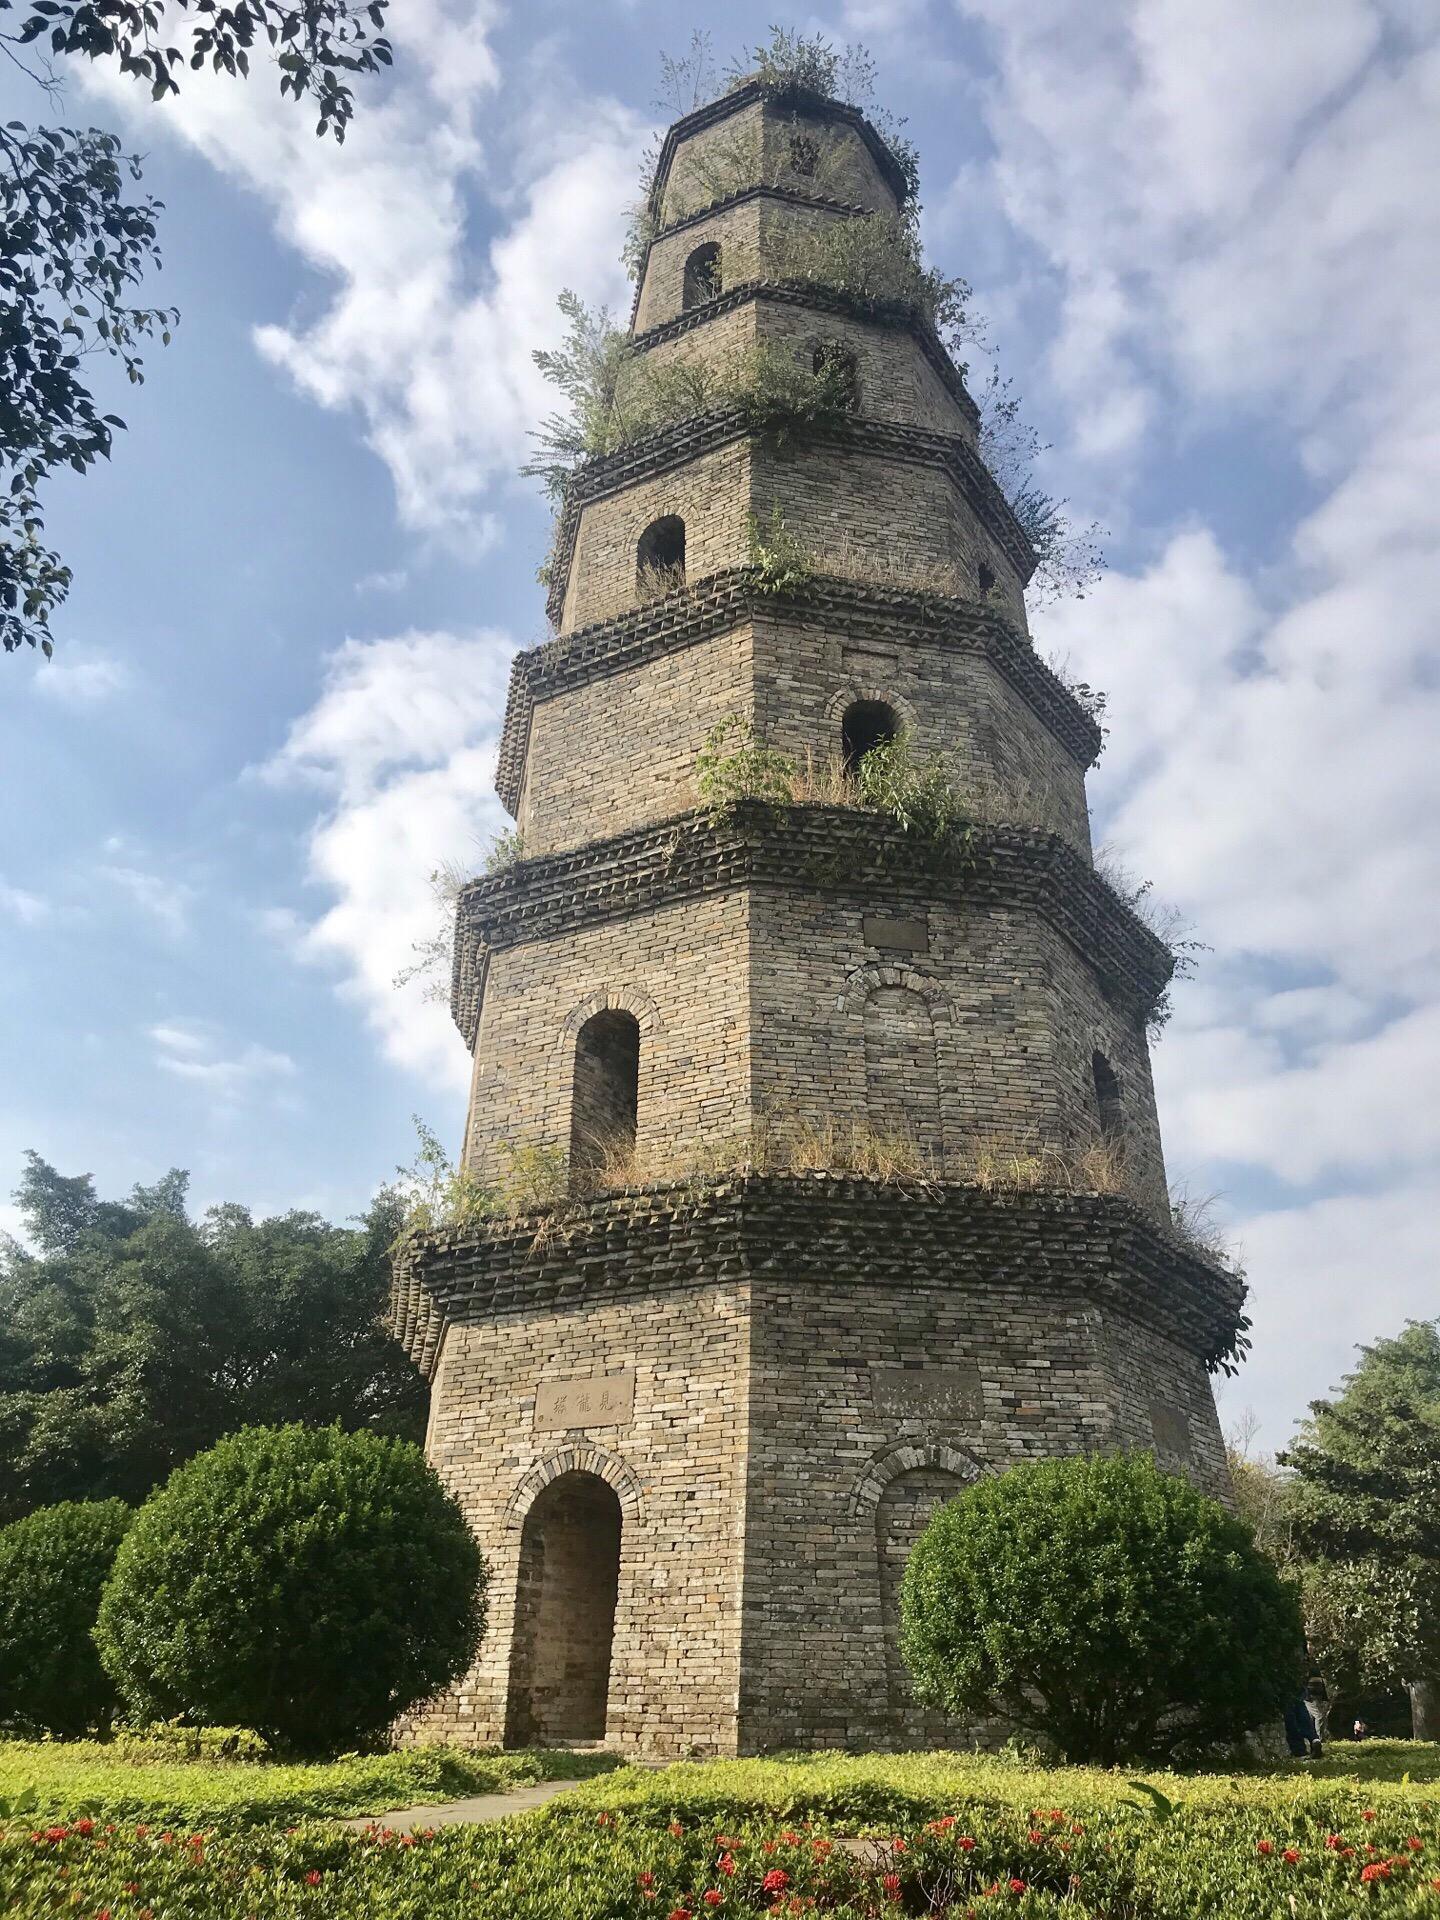 Hainan Tropical Birds World